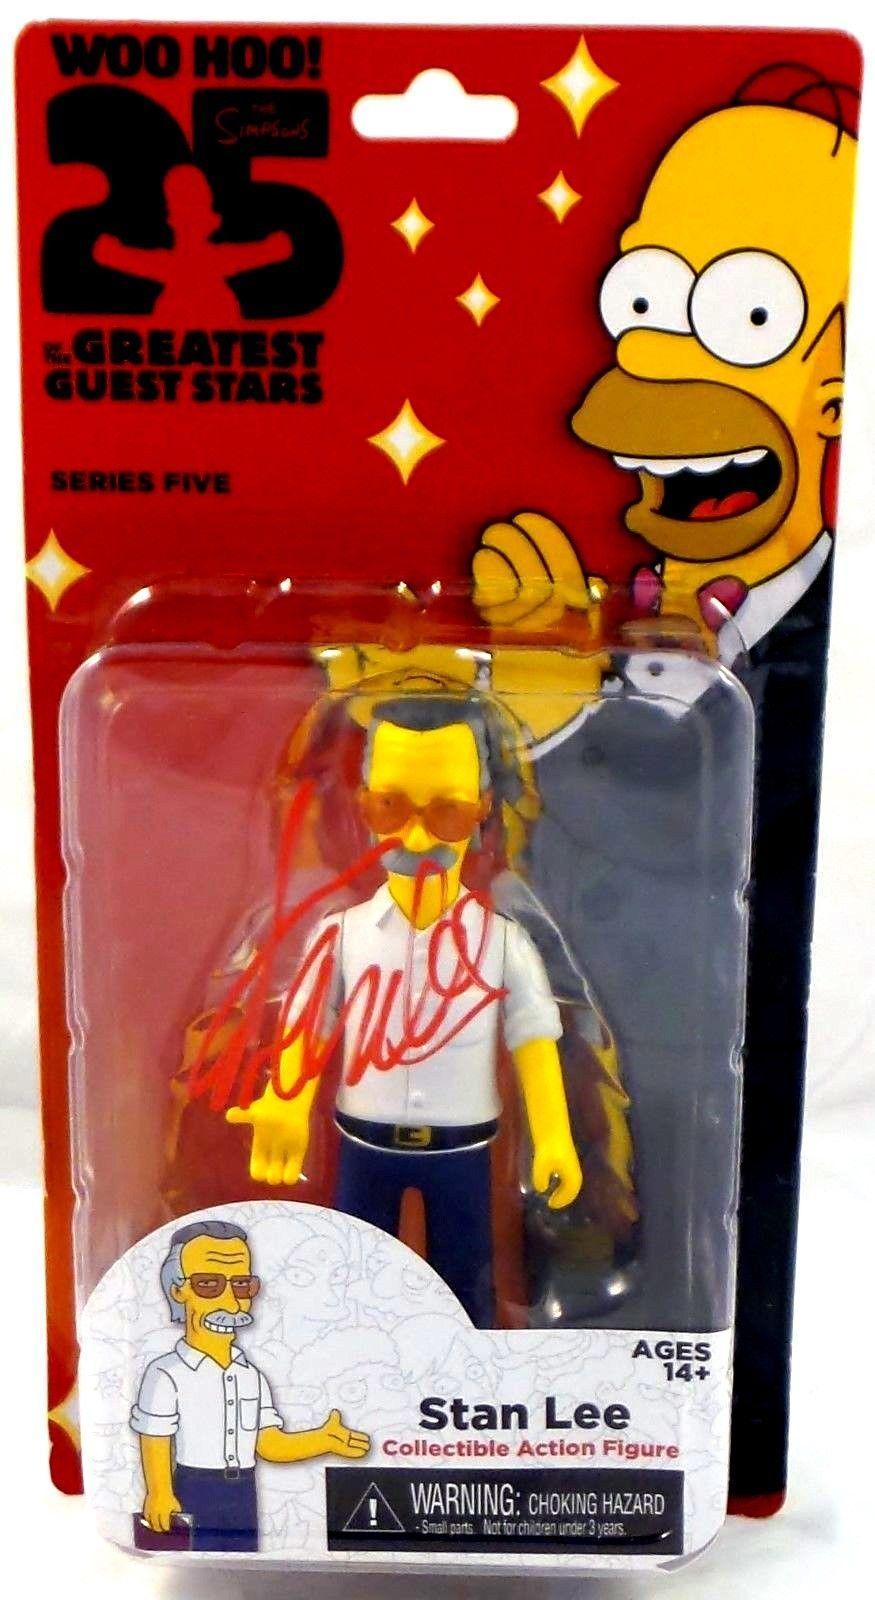 Stan Lee Signed Autographed Stan Lee Simpson's Figure JSA Authenticated